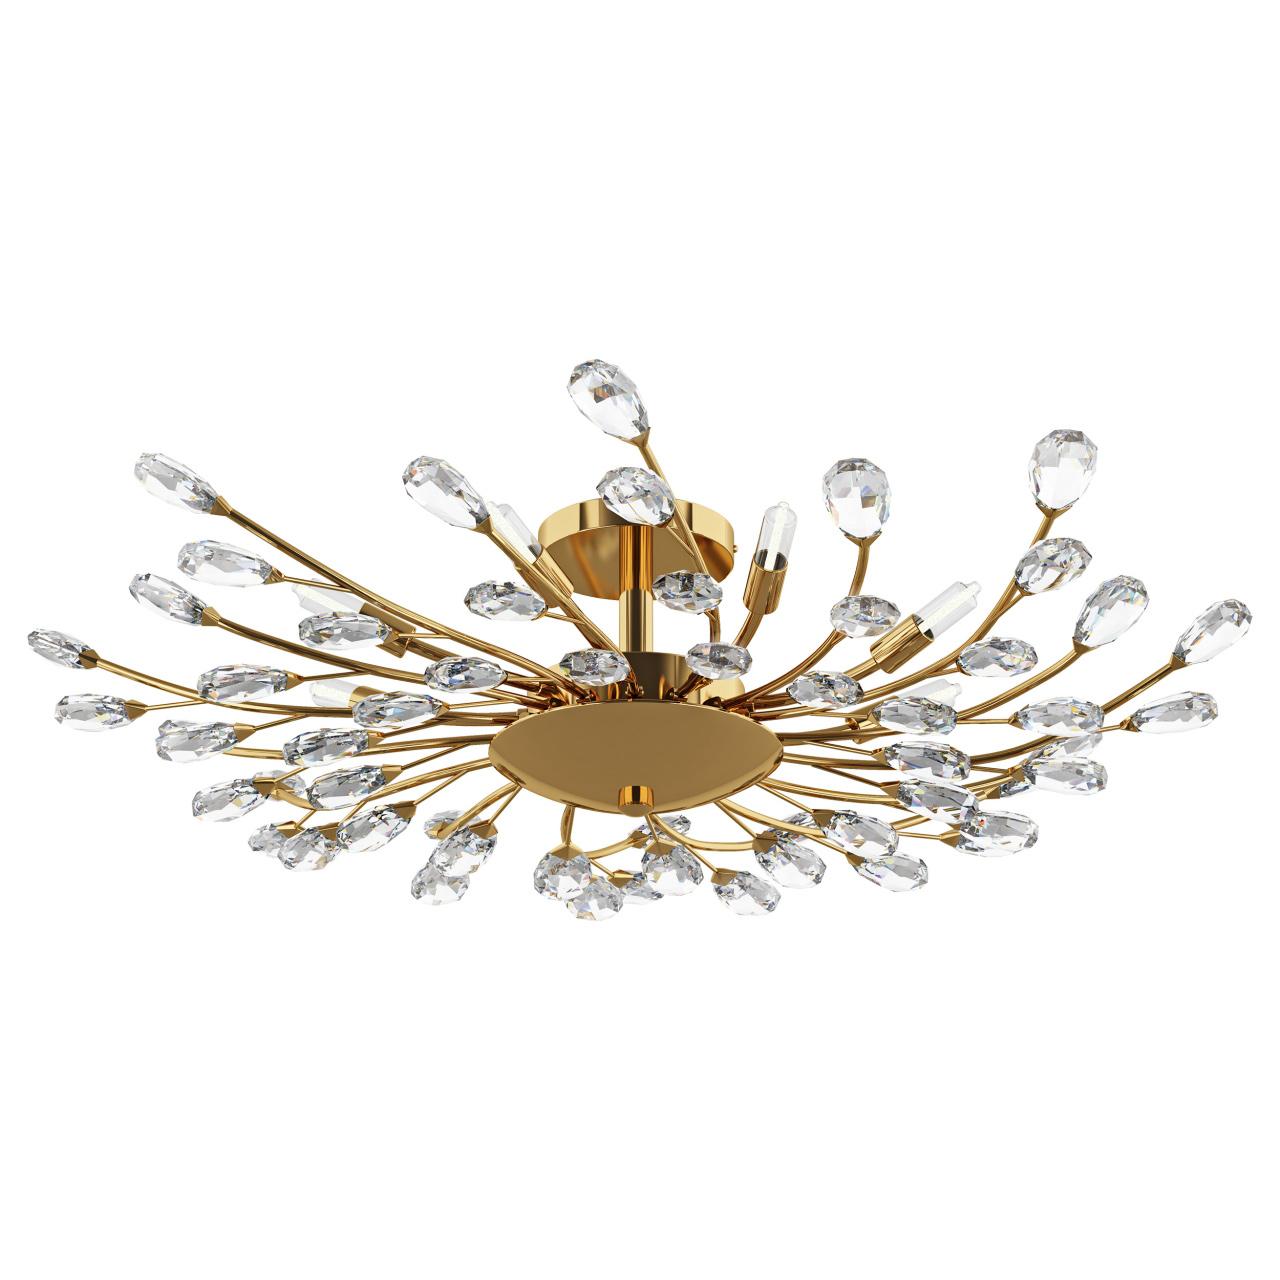 Люстра потолочная Isabelle 8х40W G9 золото Lightstar 791182